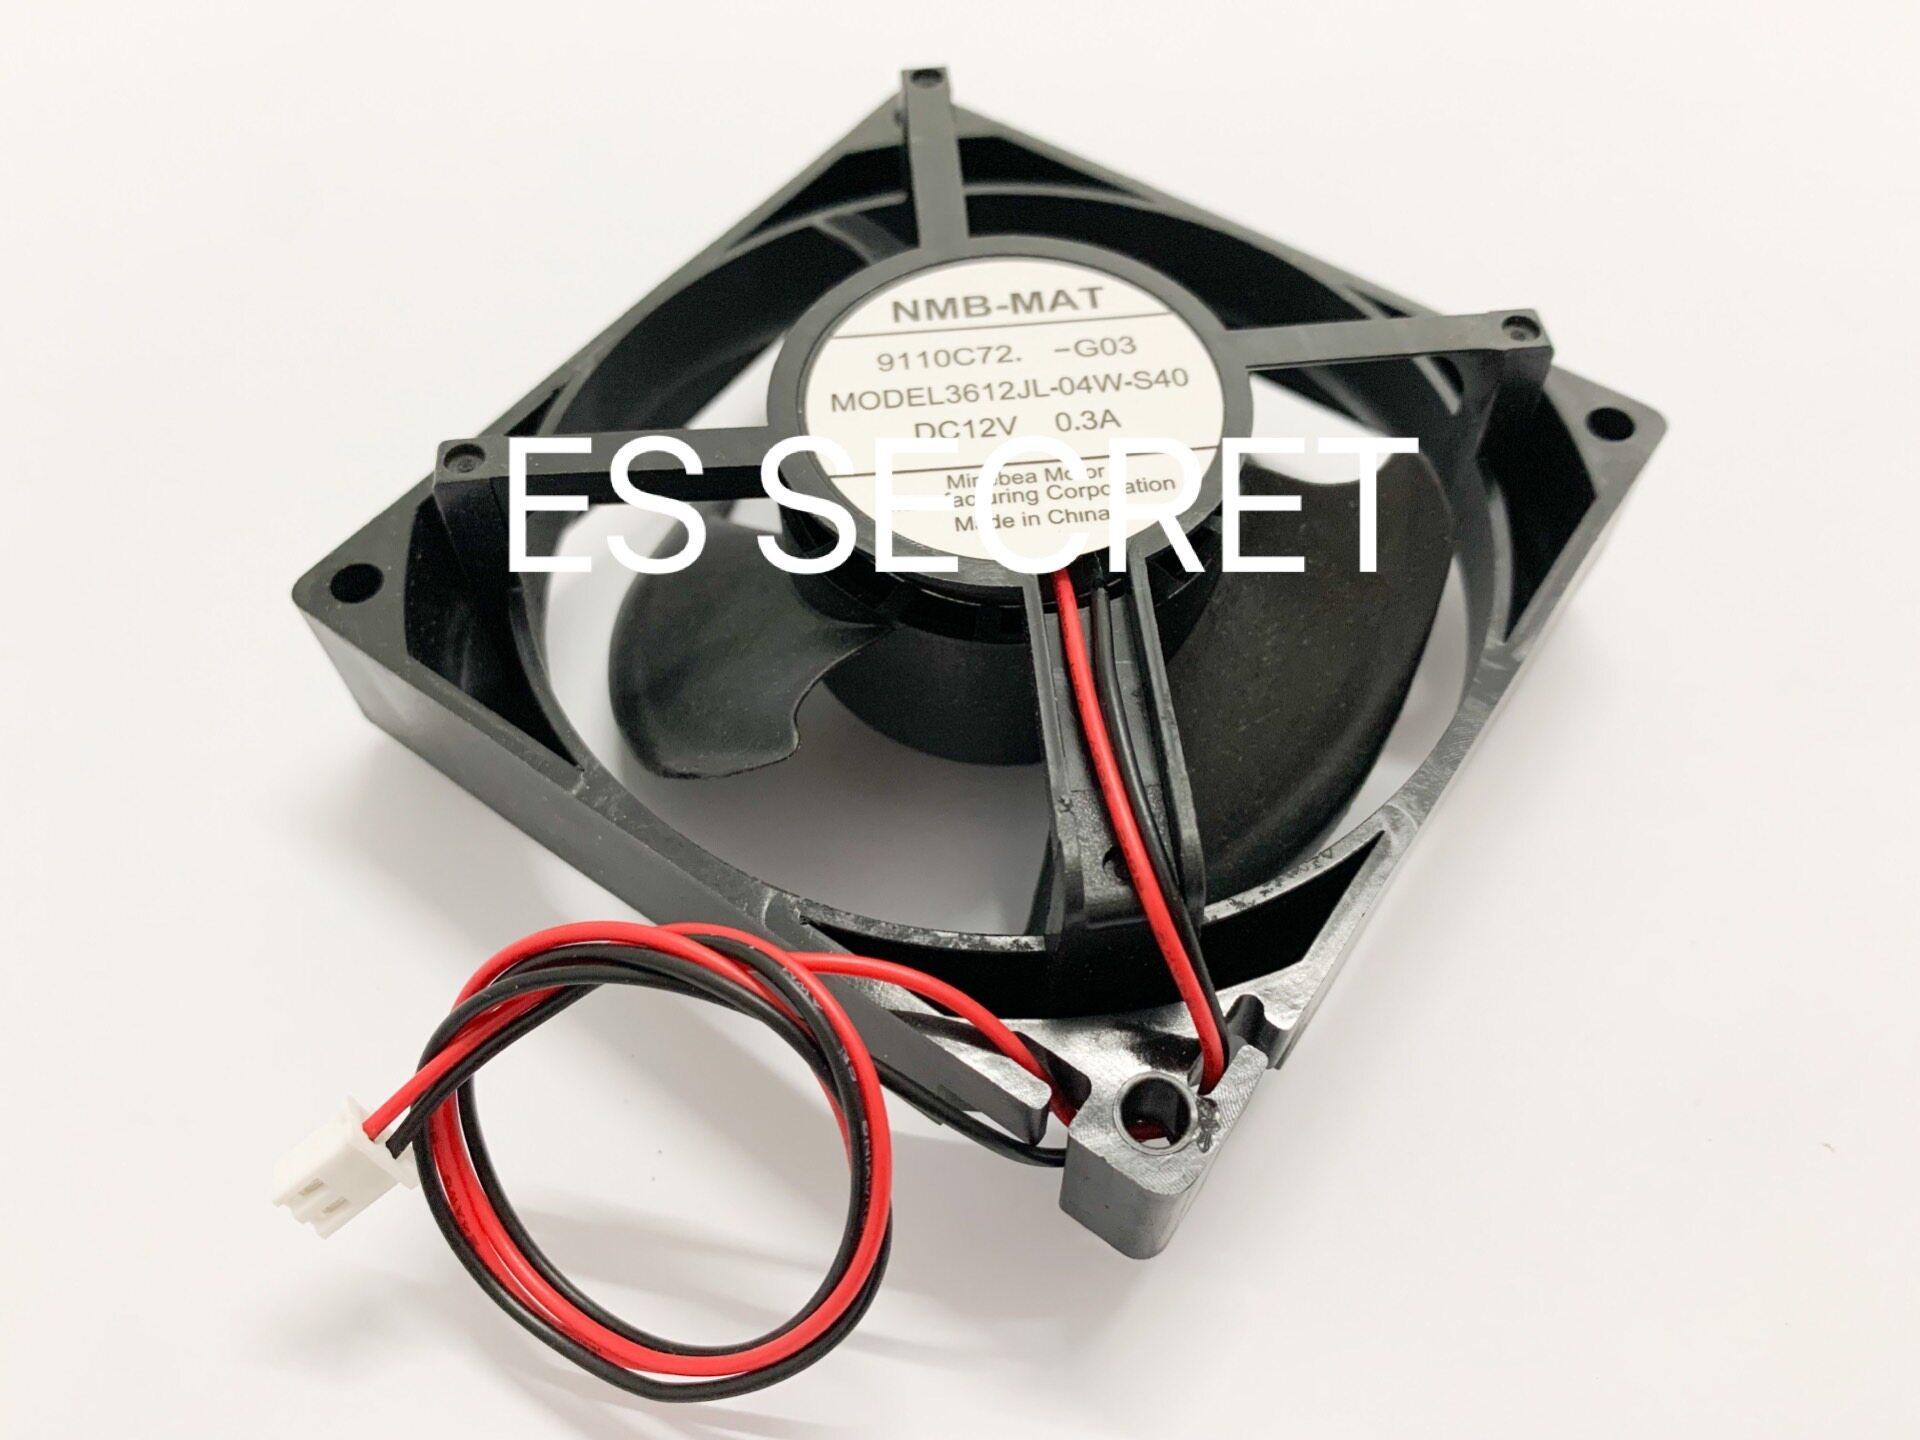 DC12V 0.3A Refrigerator Fan Motor 92X92mm 2Wire